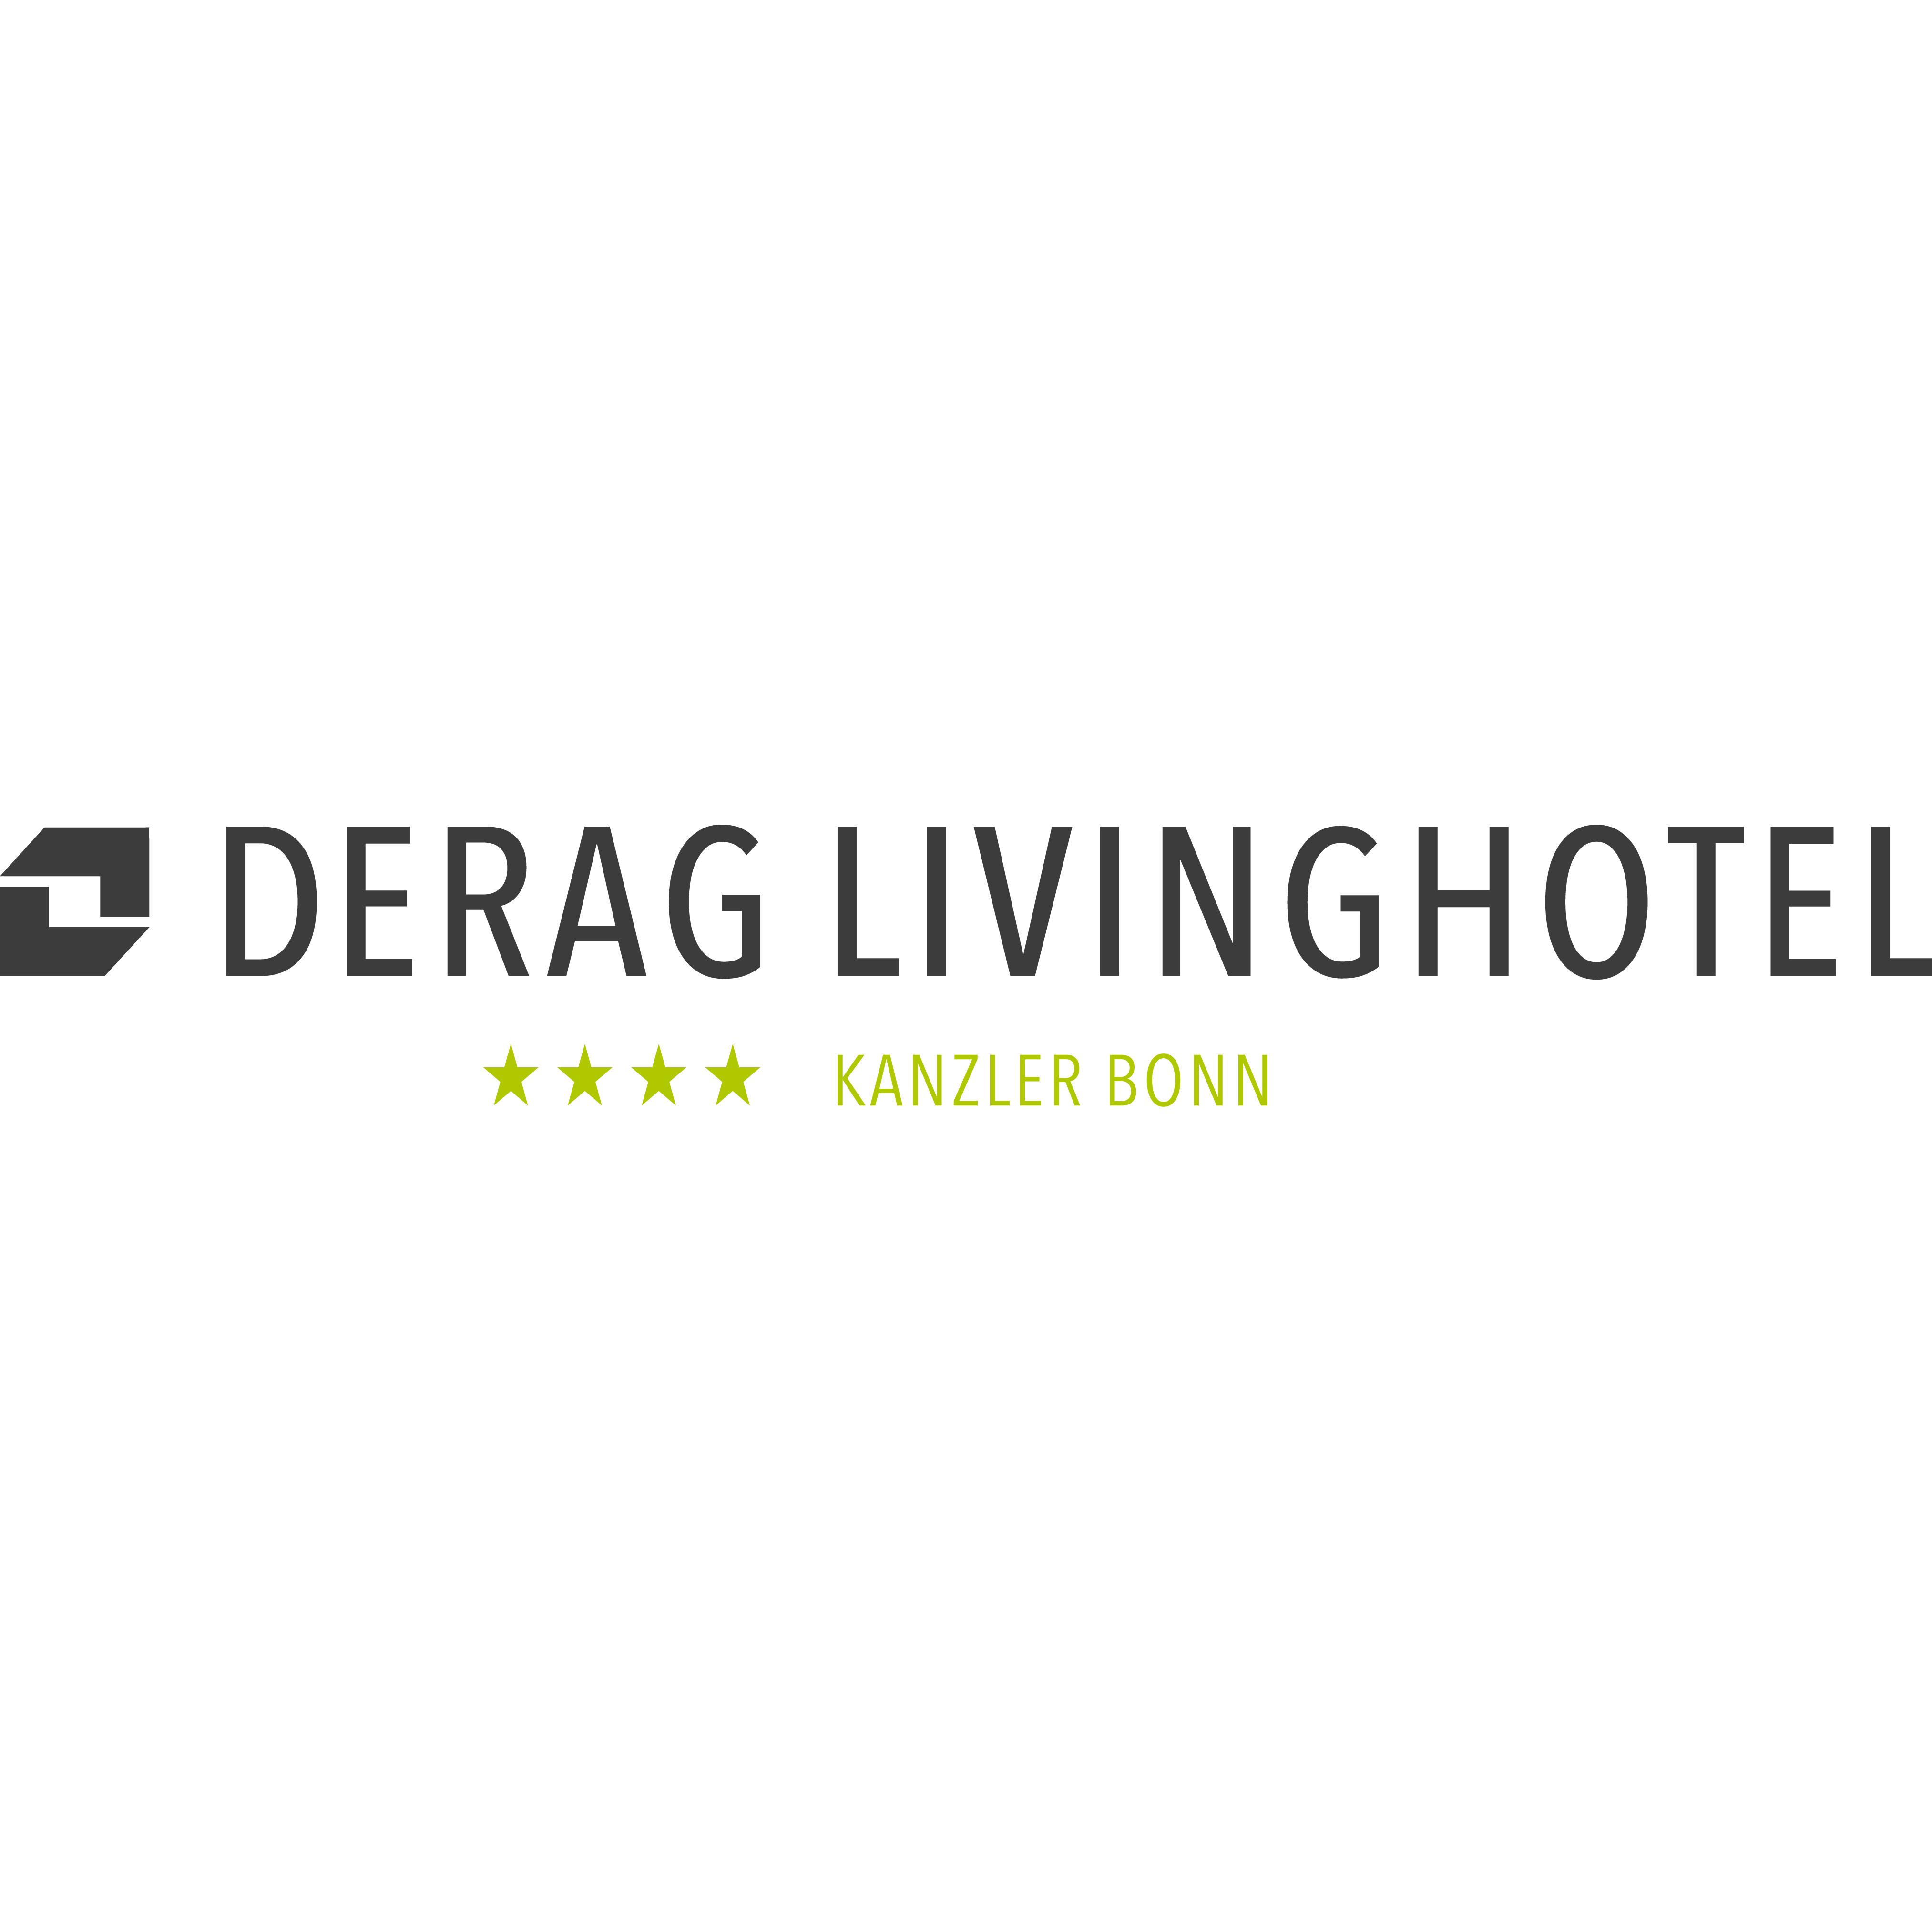 Derag Livinghotel Kanzler